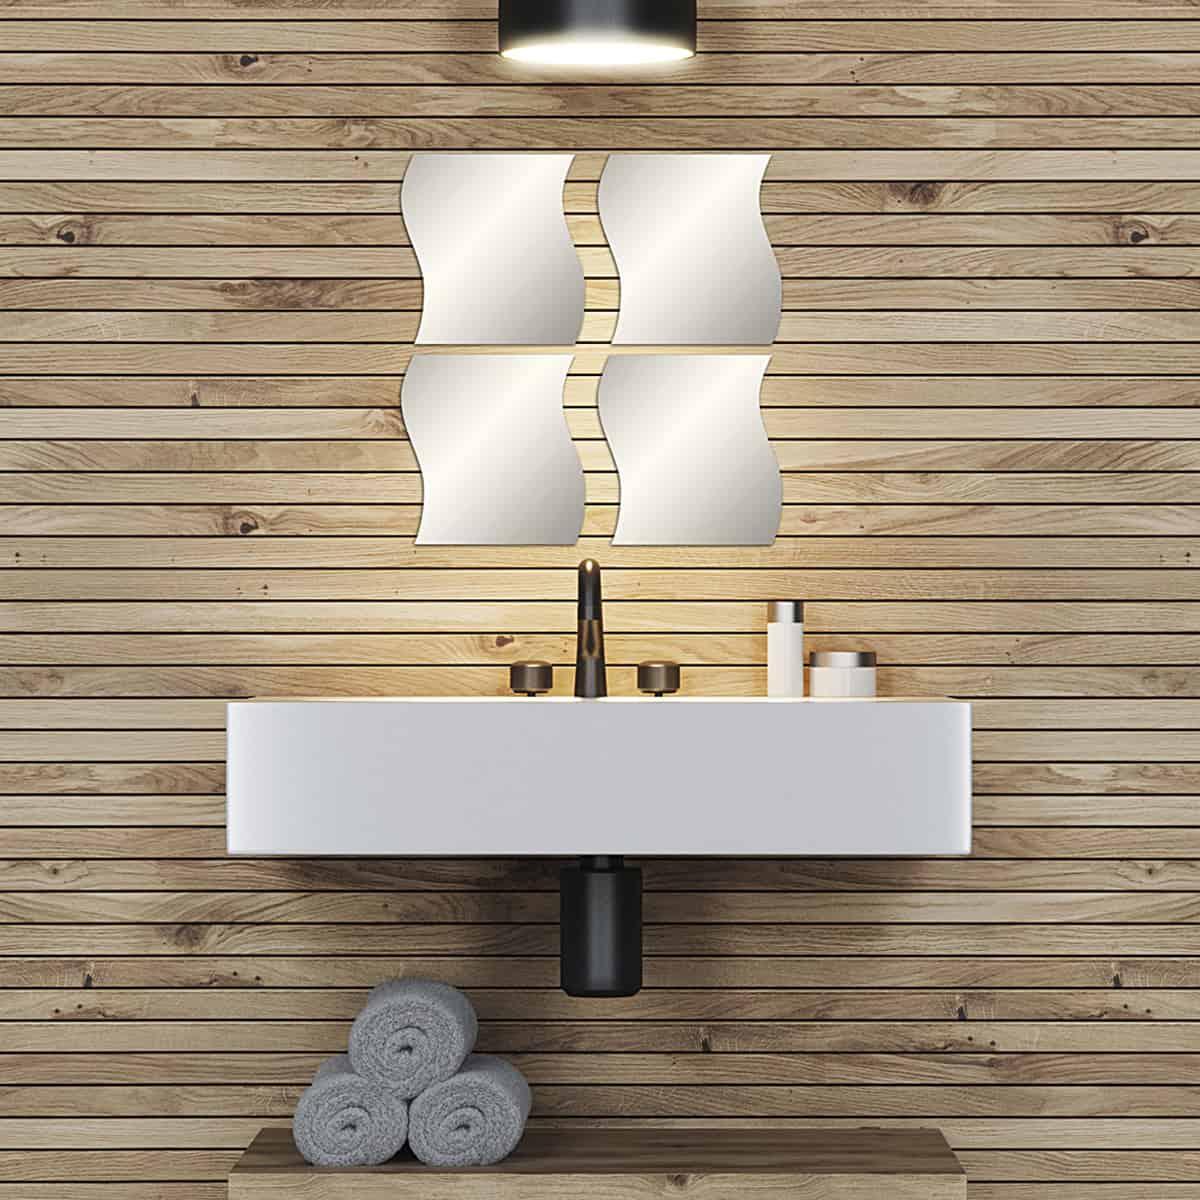 Small Decorative Wall Self Adhesive Shaped Mirrors Set Of 4